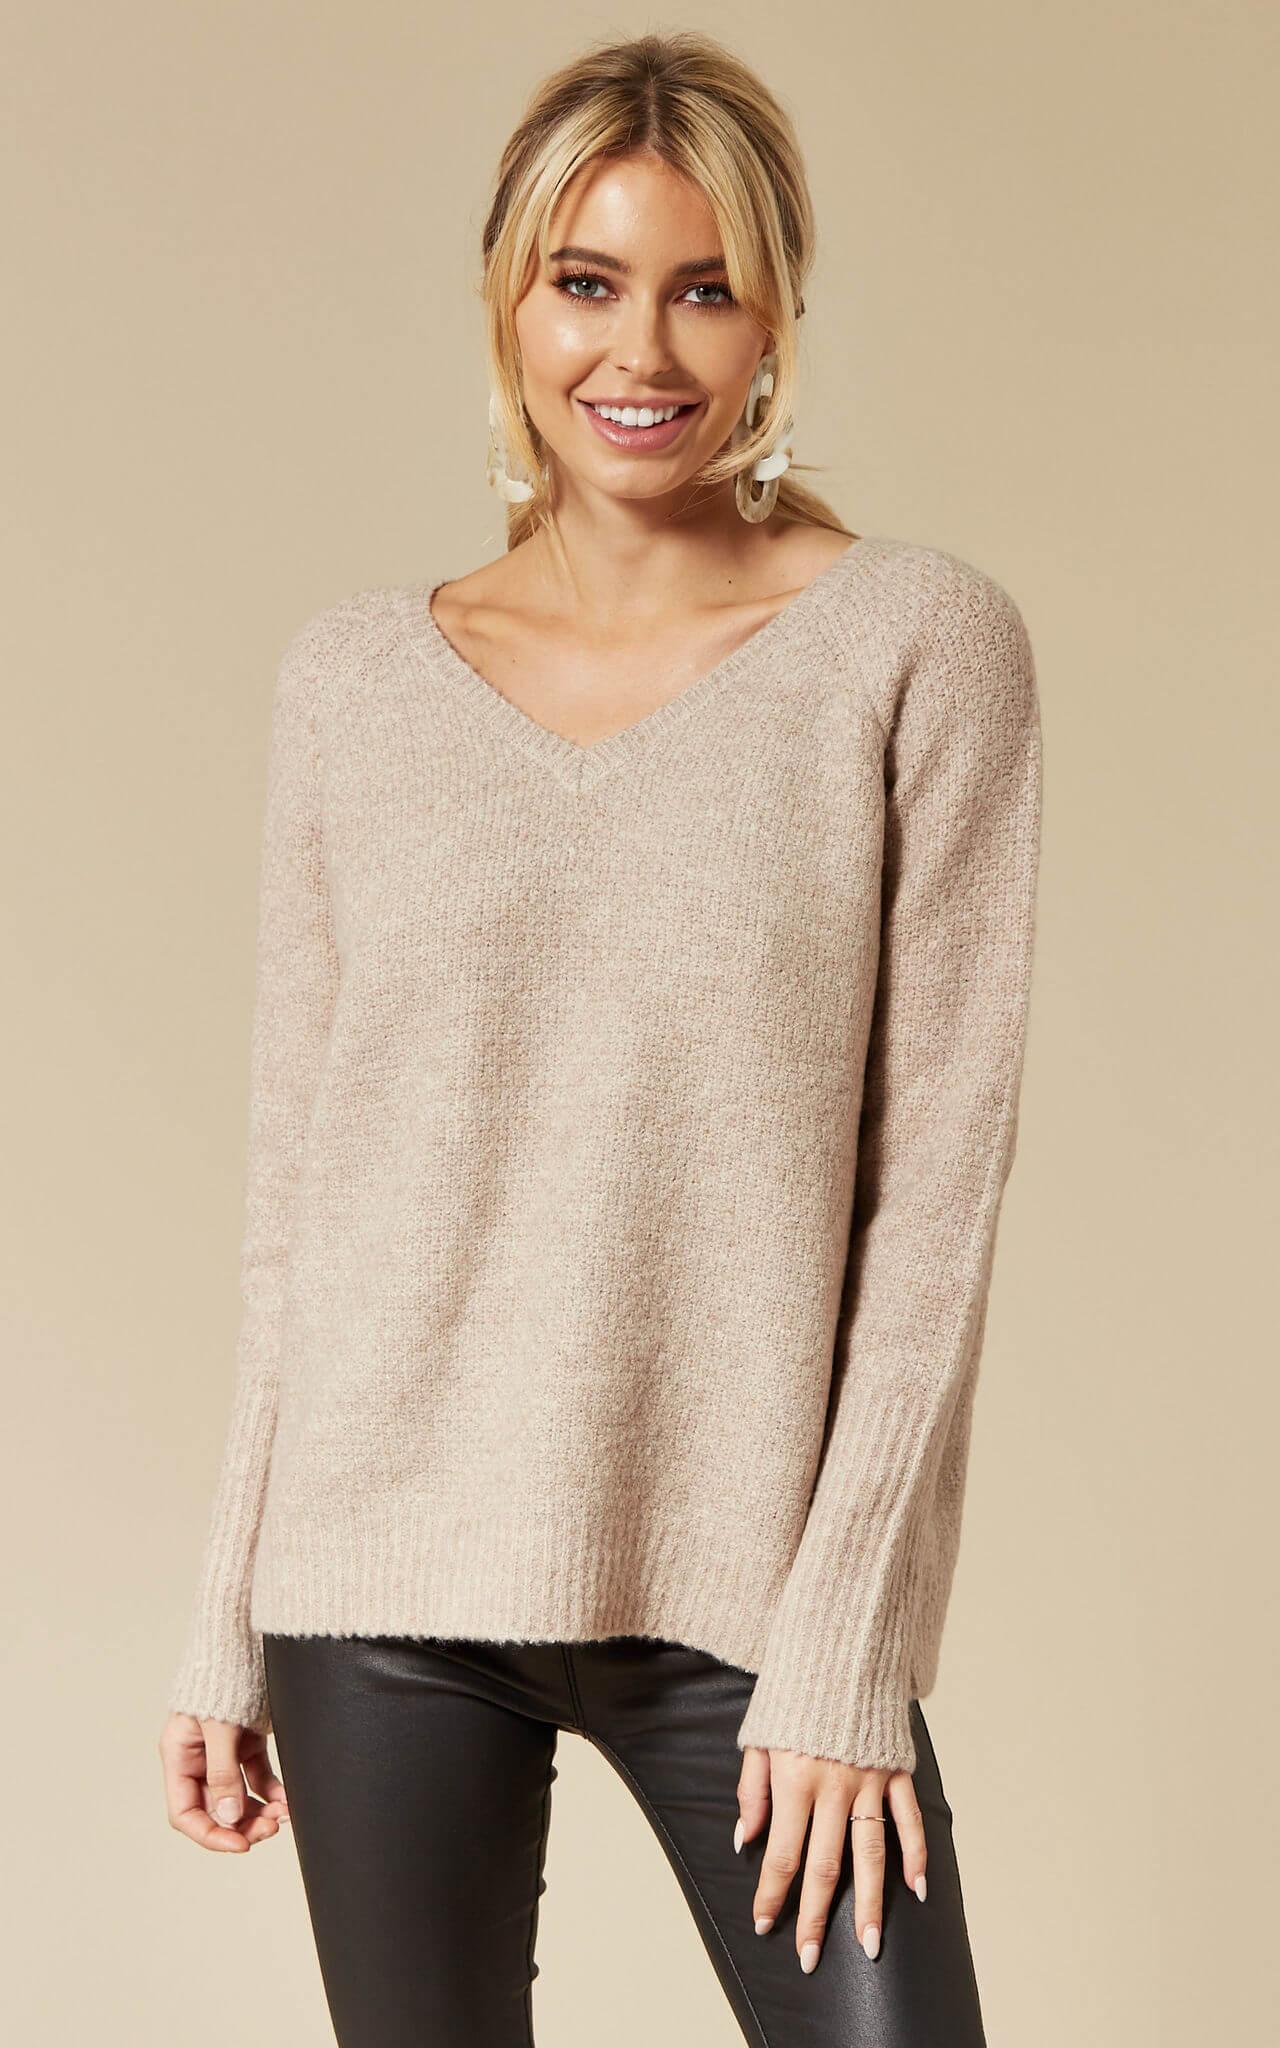 Model wears a natural coloured jumper with a v neckline